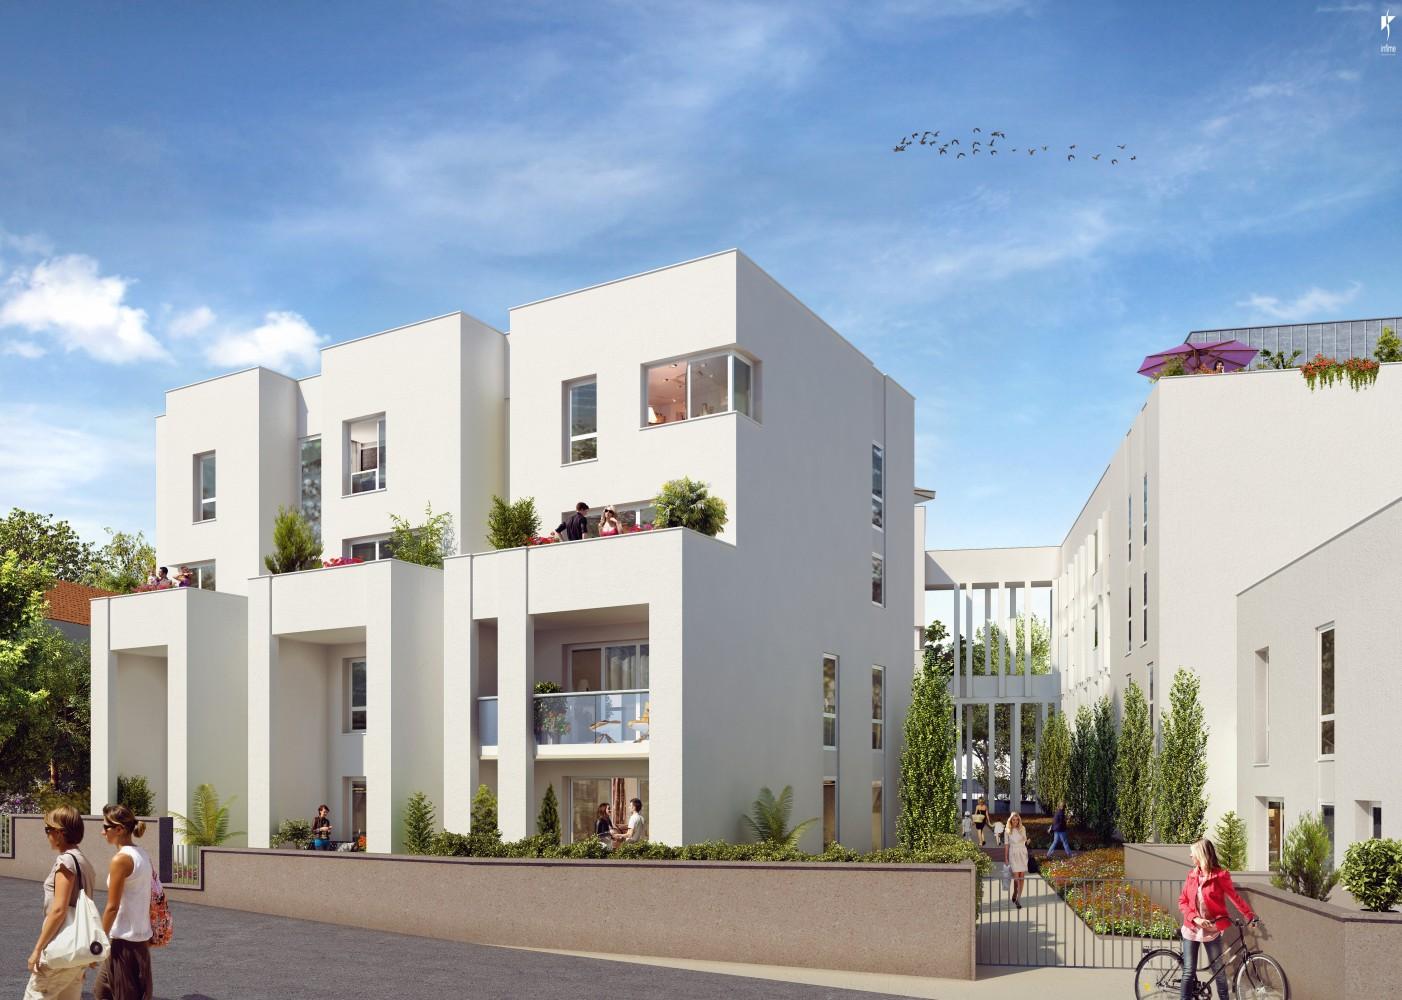 Programme neuf appartements neufs loi pinel lyon 69009 for Appartement neuf bordeaux loi pinel